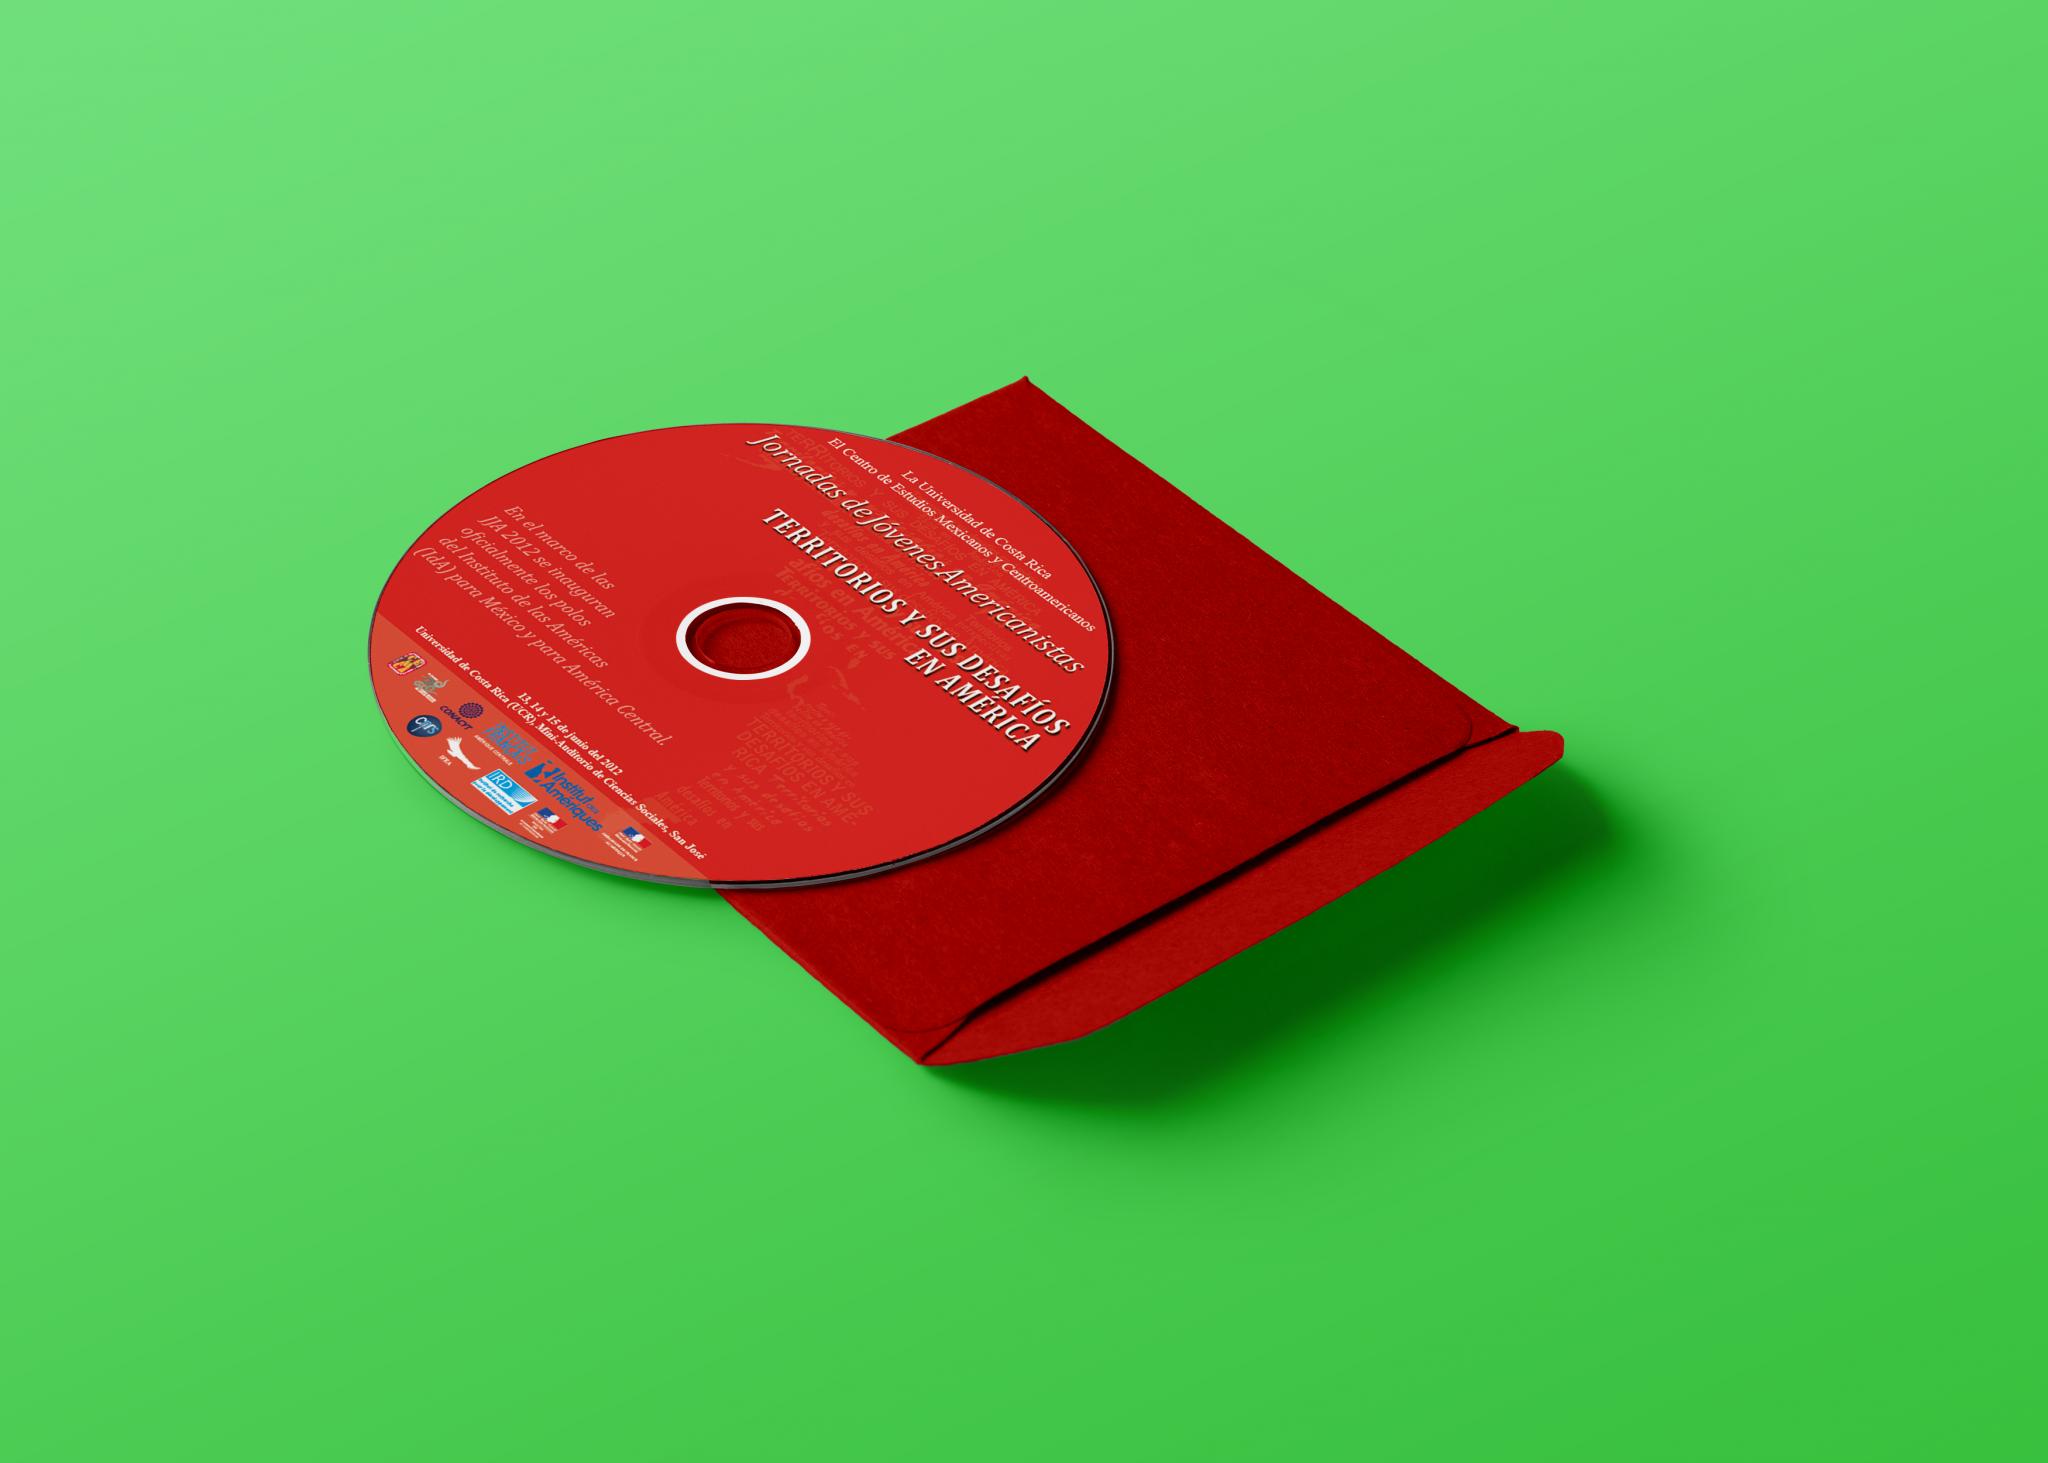 cemca-cd